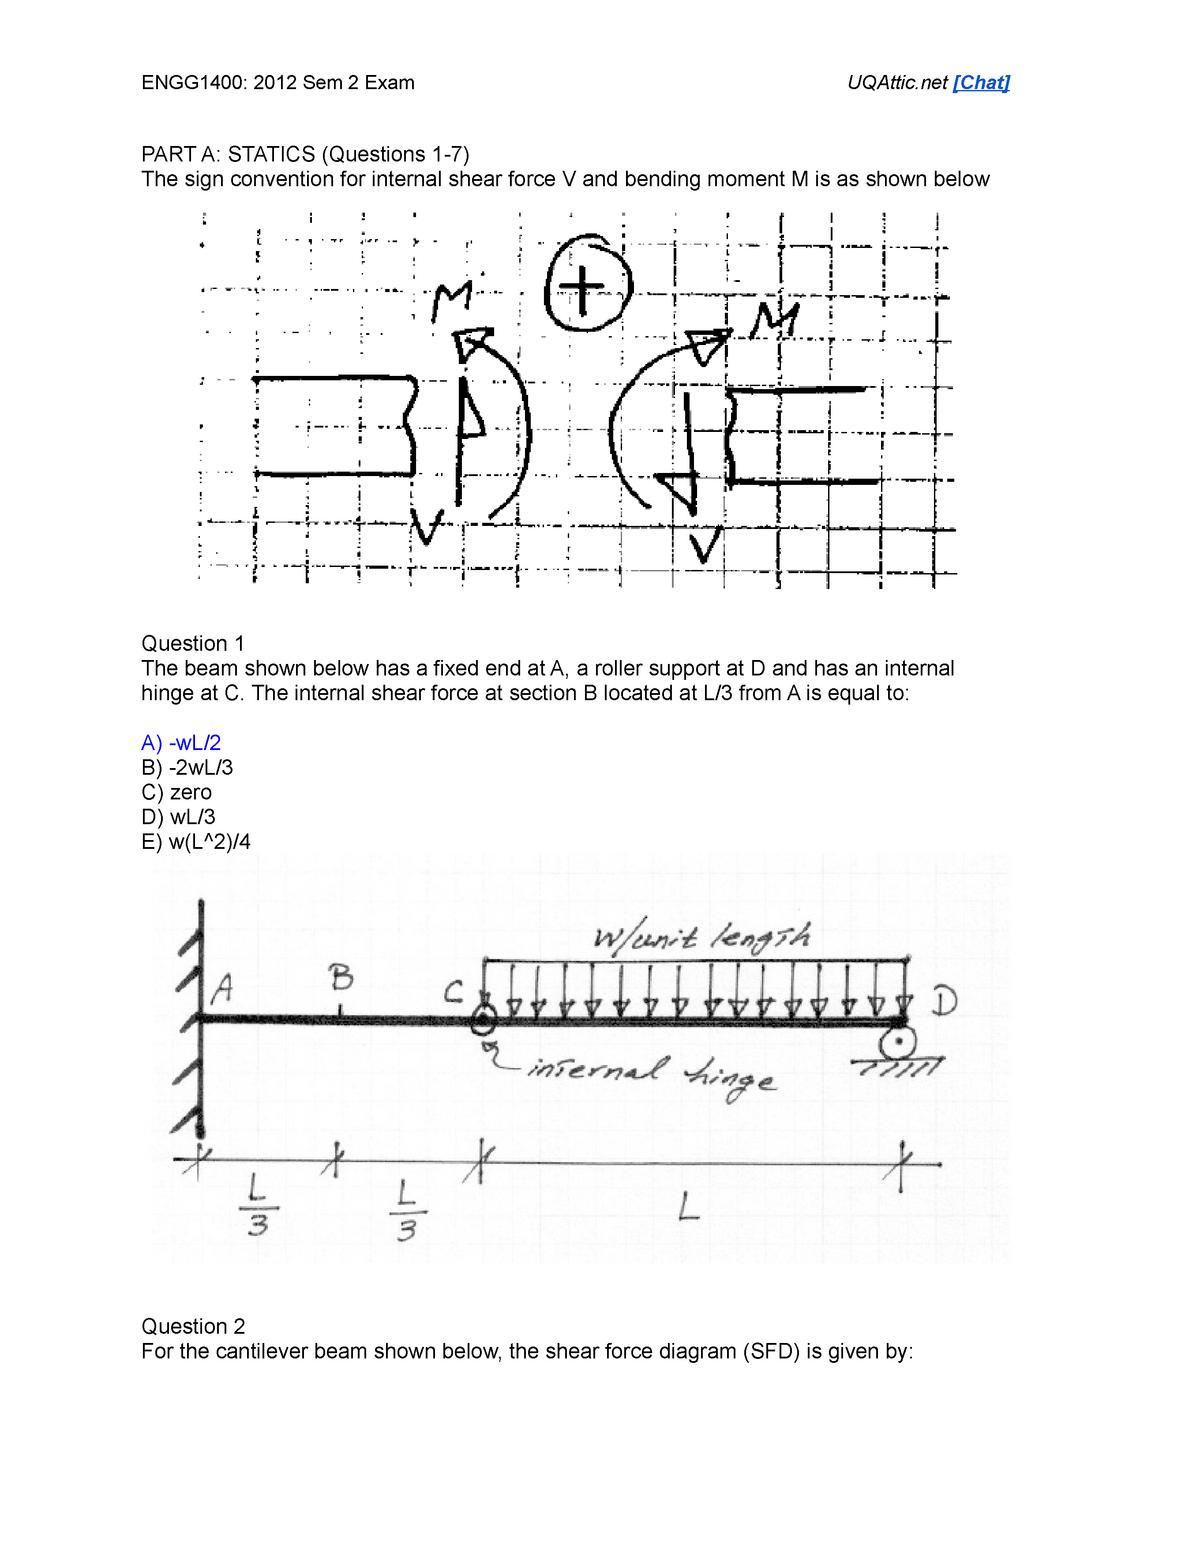 Exam 2012 - ENGG1400: Engineering Mechanics: Statics